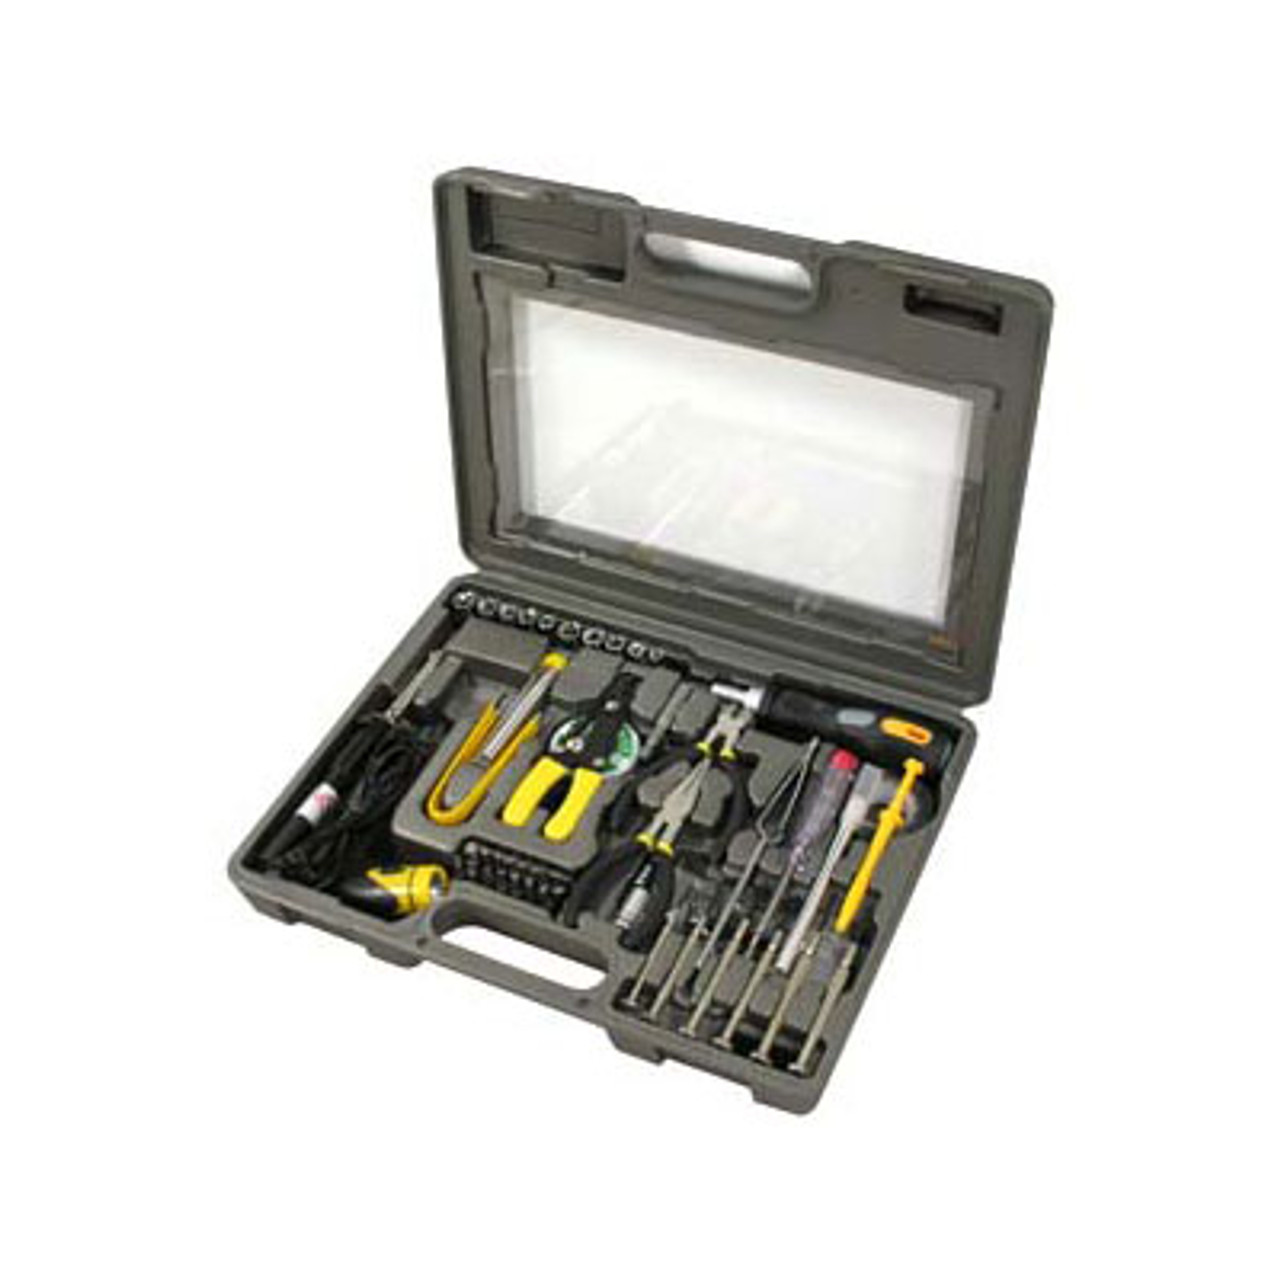 56 Piece Electronic Repair Tool Kit